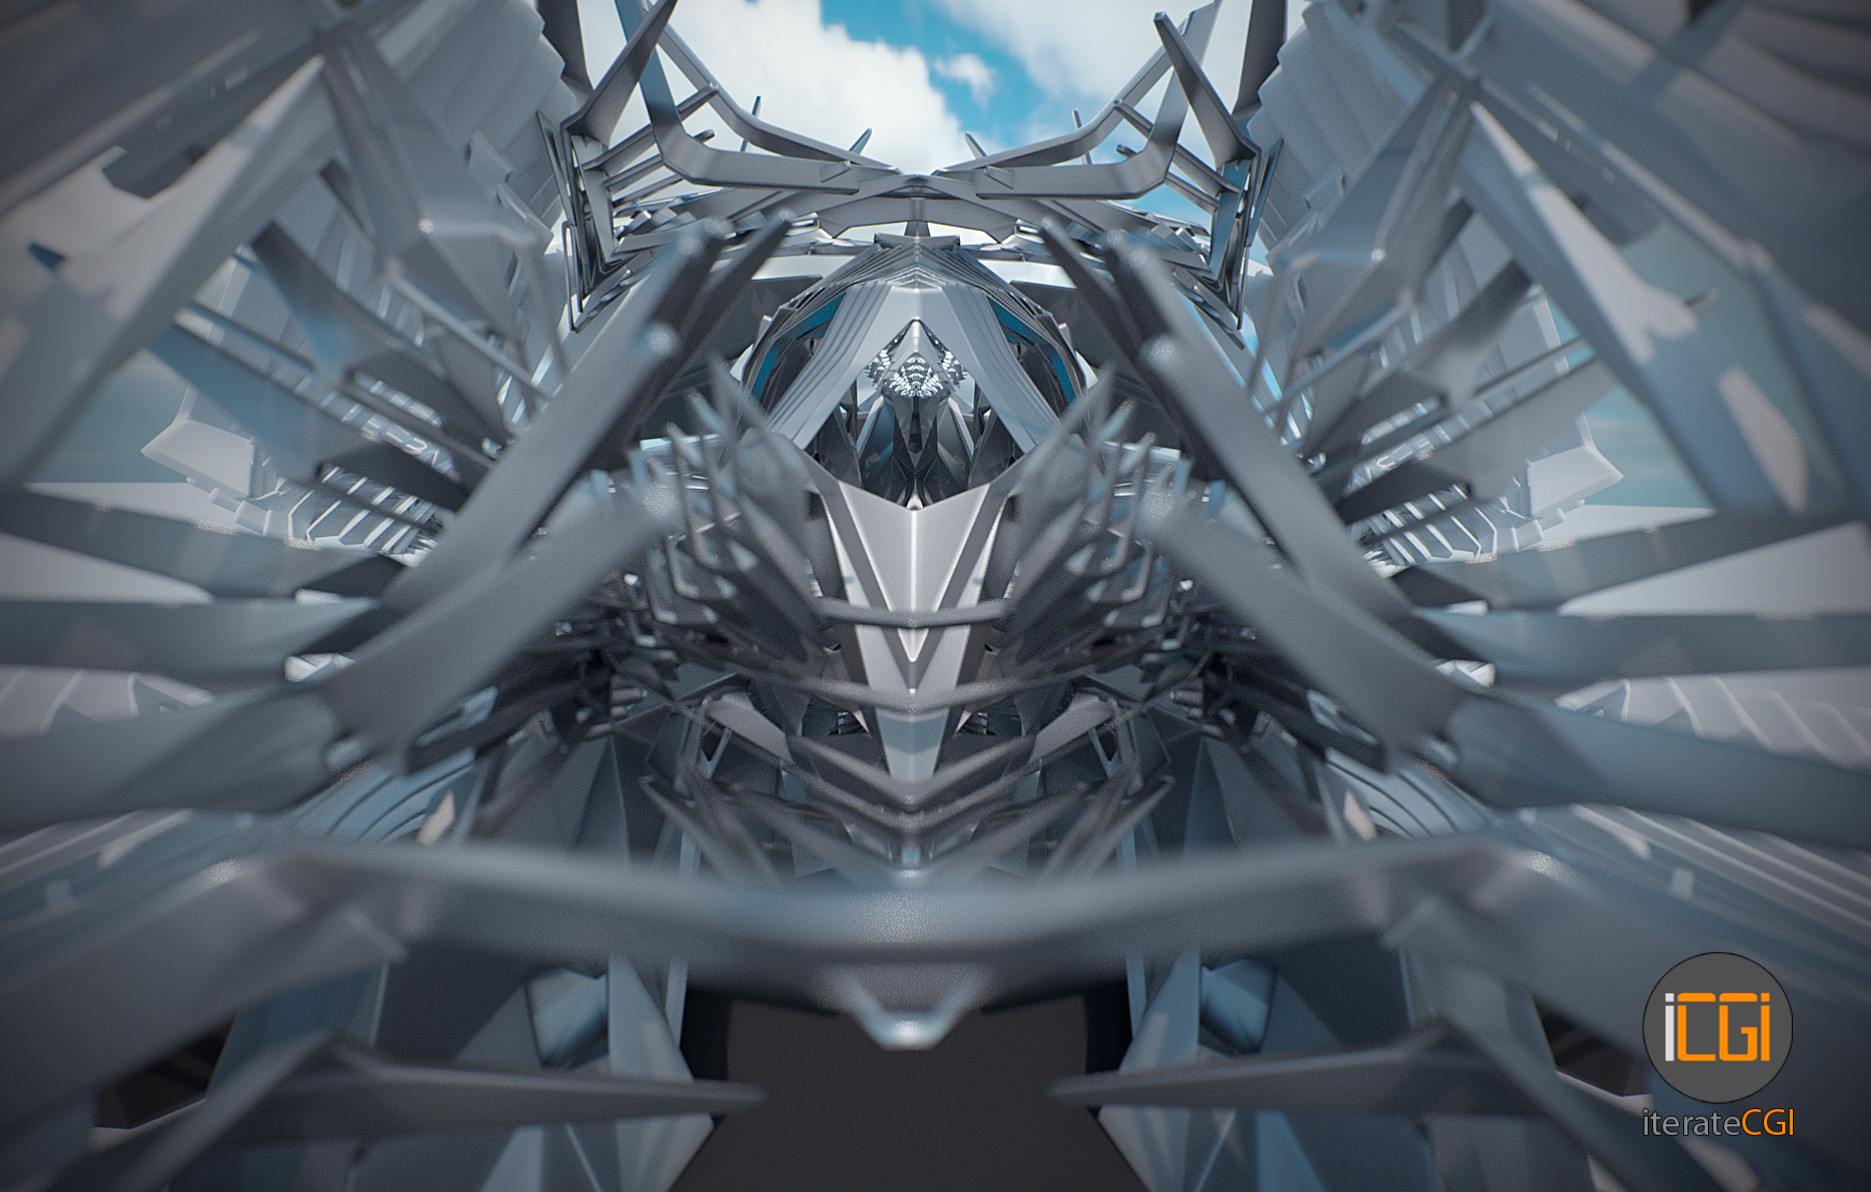 Johan de leenheer generative 3d symmetries 2